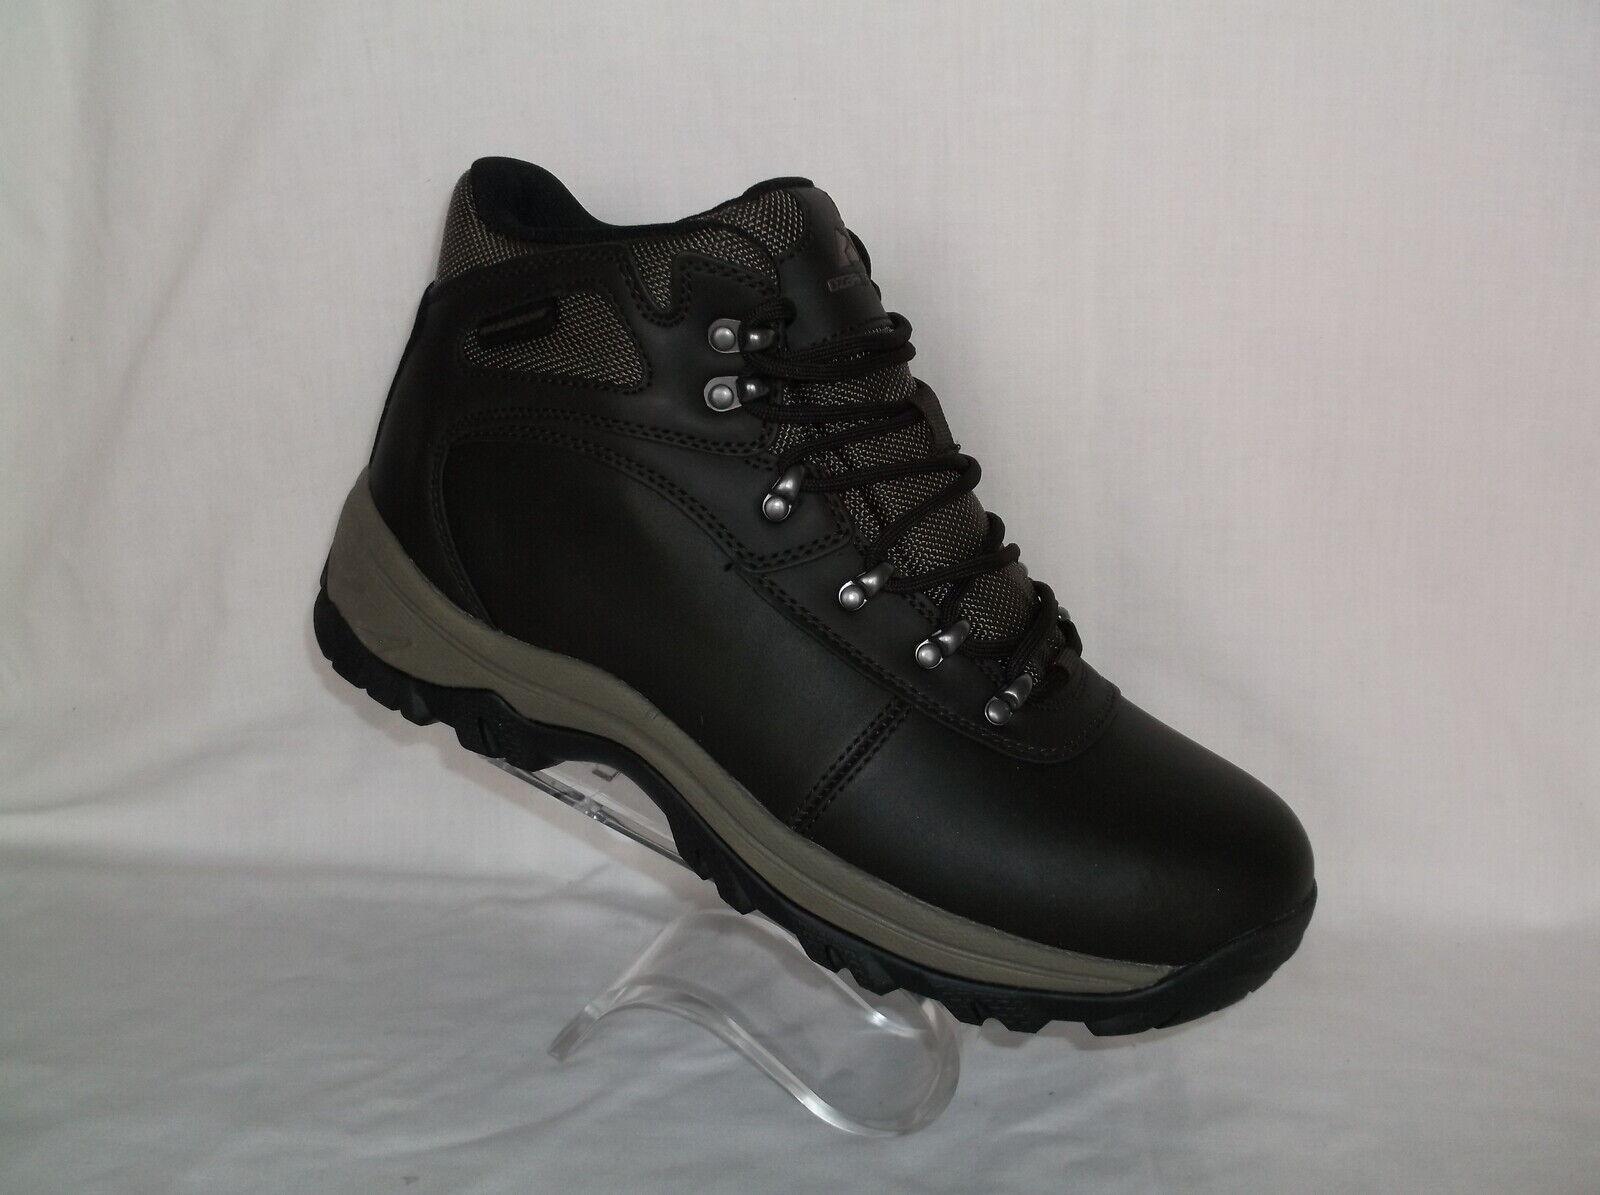 Ozark Trail Men's Bronte Hiking Shoes